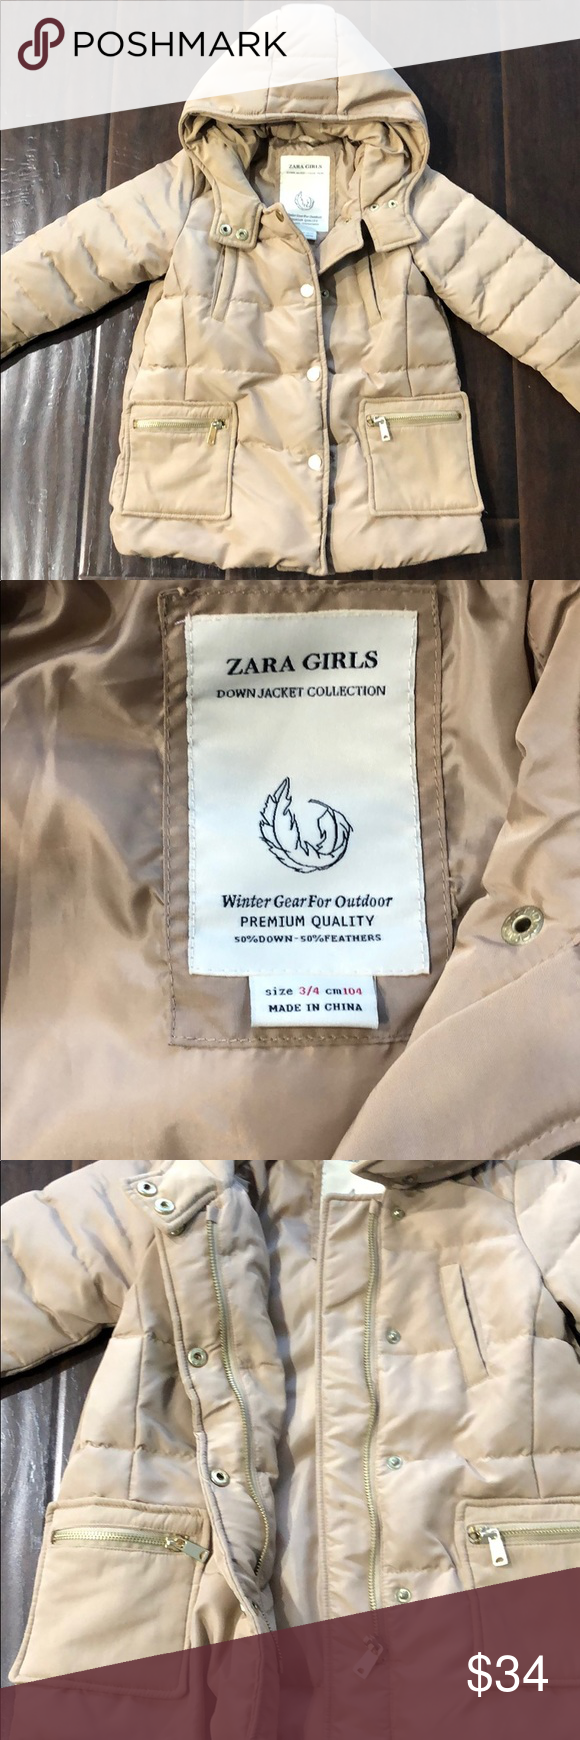 Zara Girls Down Puffer Jacket Zara Girl Jackets Zara [ 1740 x 580 Pixel ]